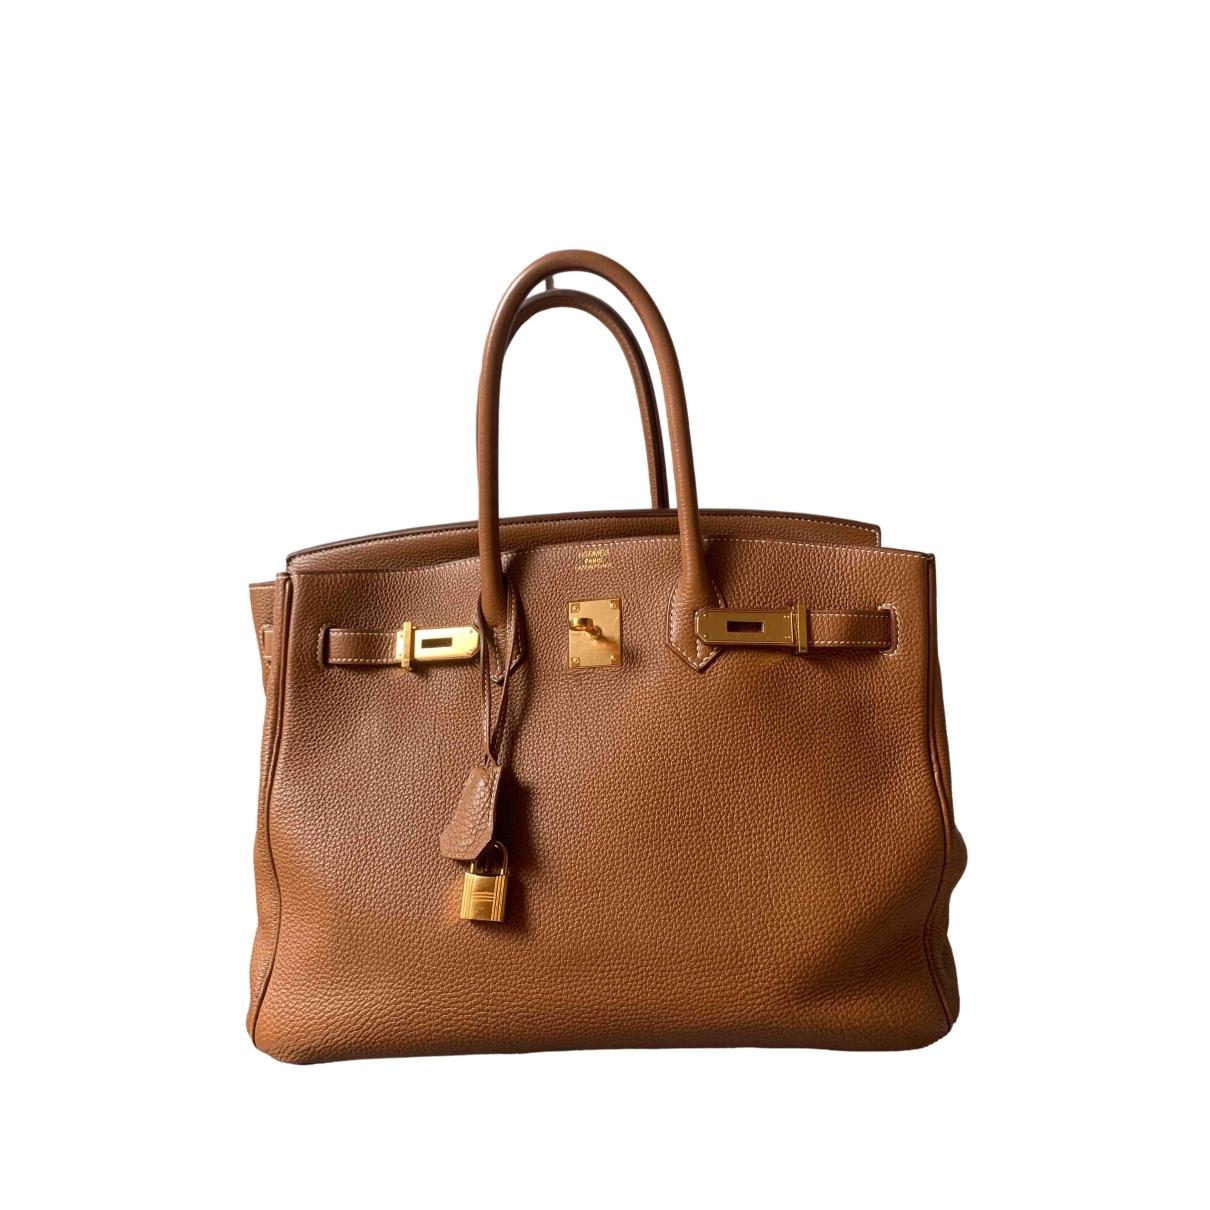 Hermes - Sac a main Birkin 35 pour femme en cuir - marron